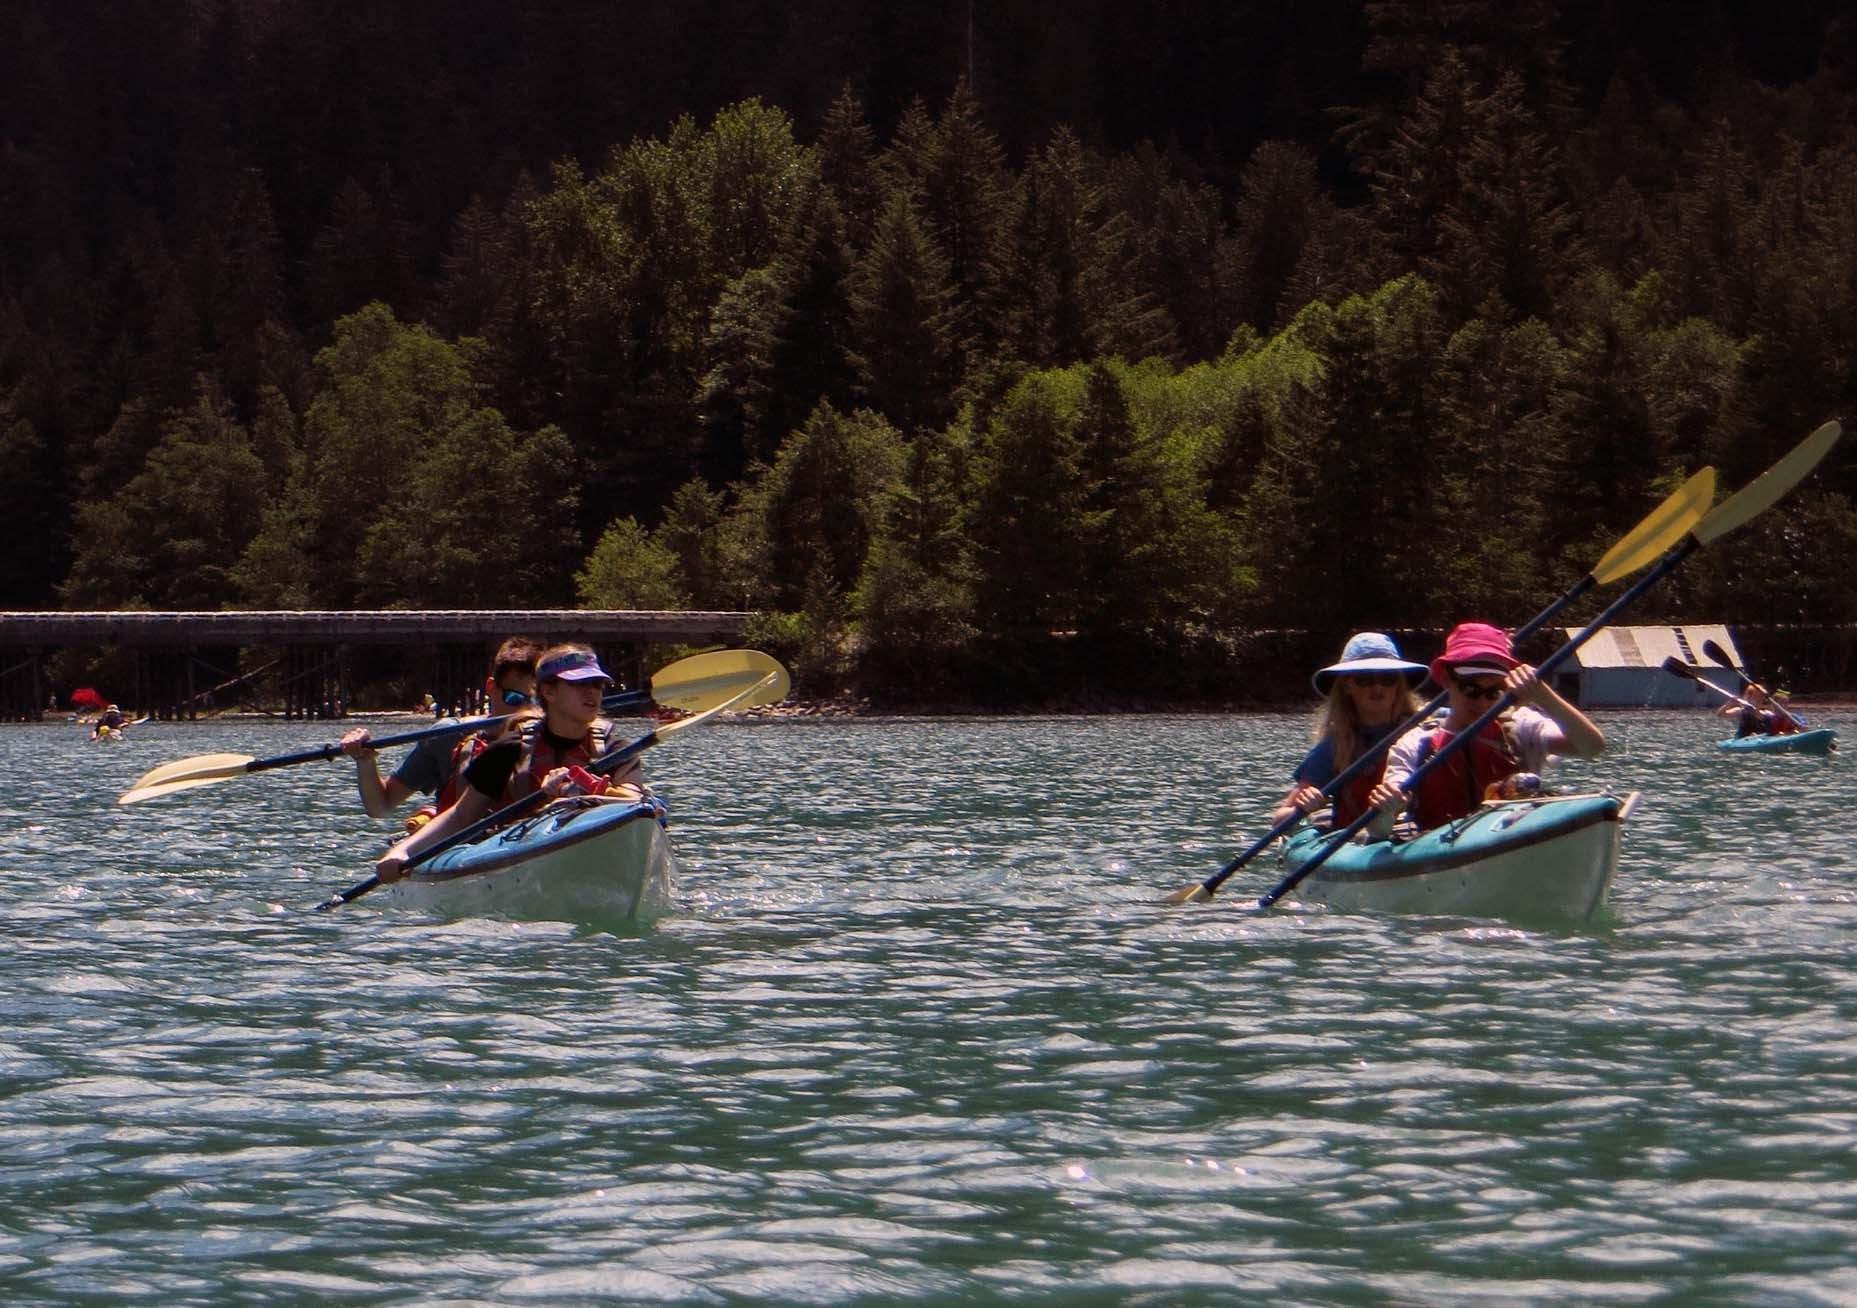 kayakcampingtrip.jpg#asset:8756